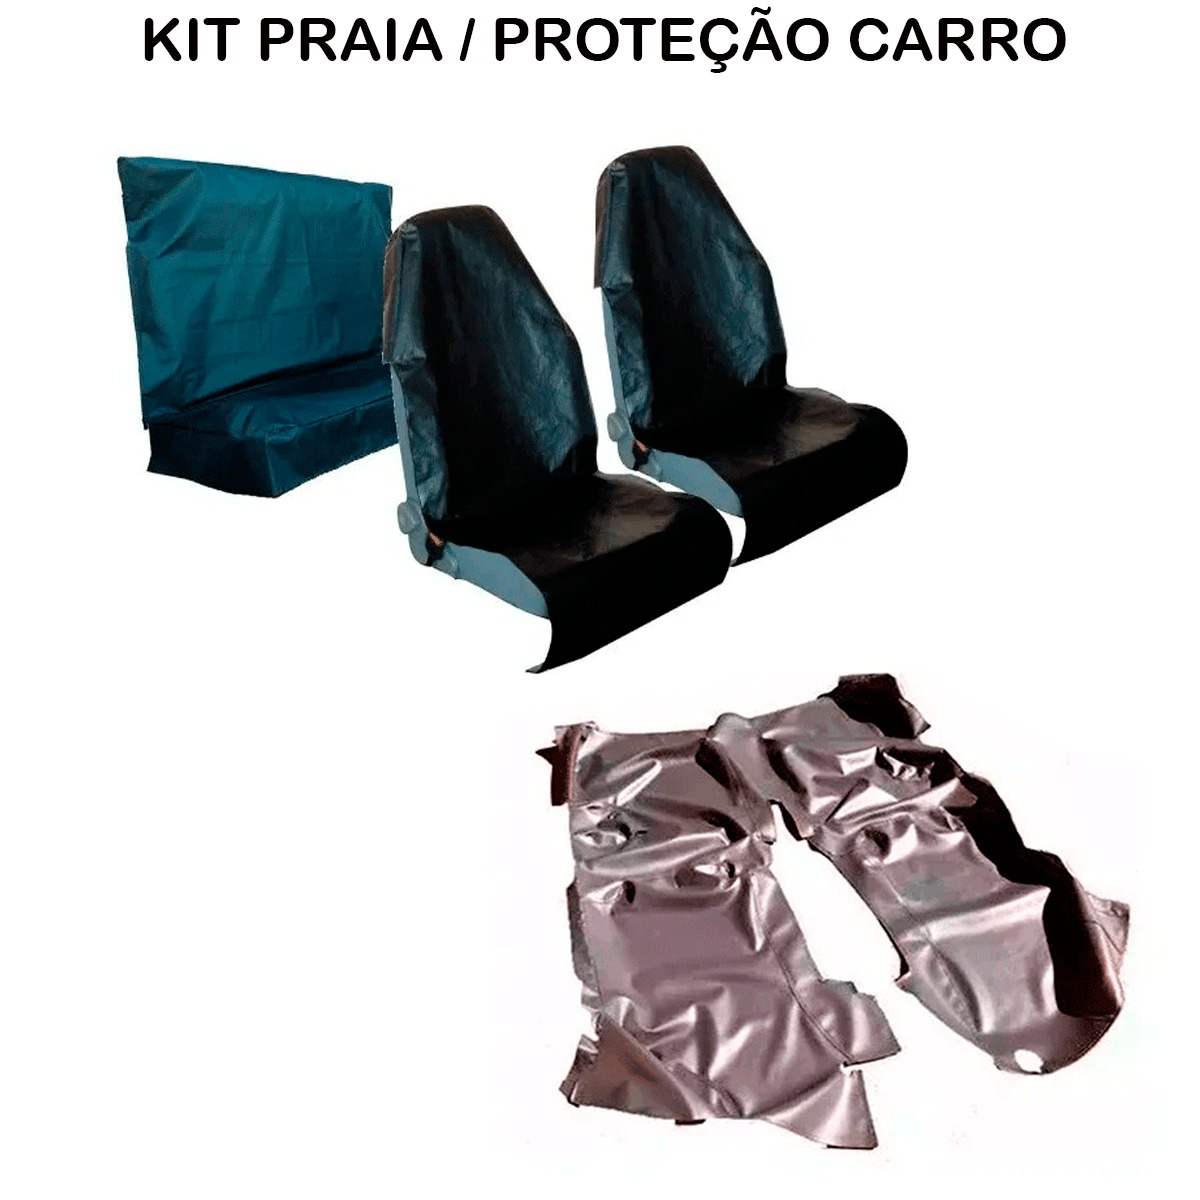 Tapete Em Vinil Fiat Idea até 2010 + Capa Banco Protecao Banco Areia Suor Academia